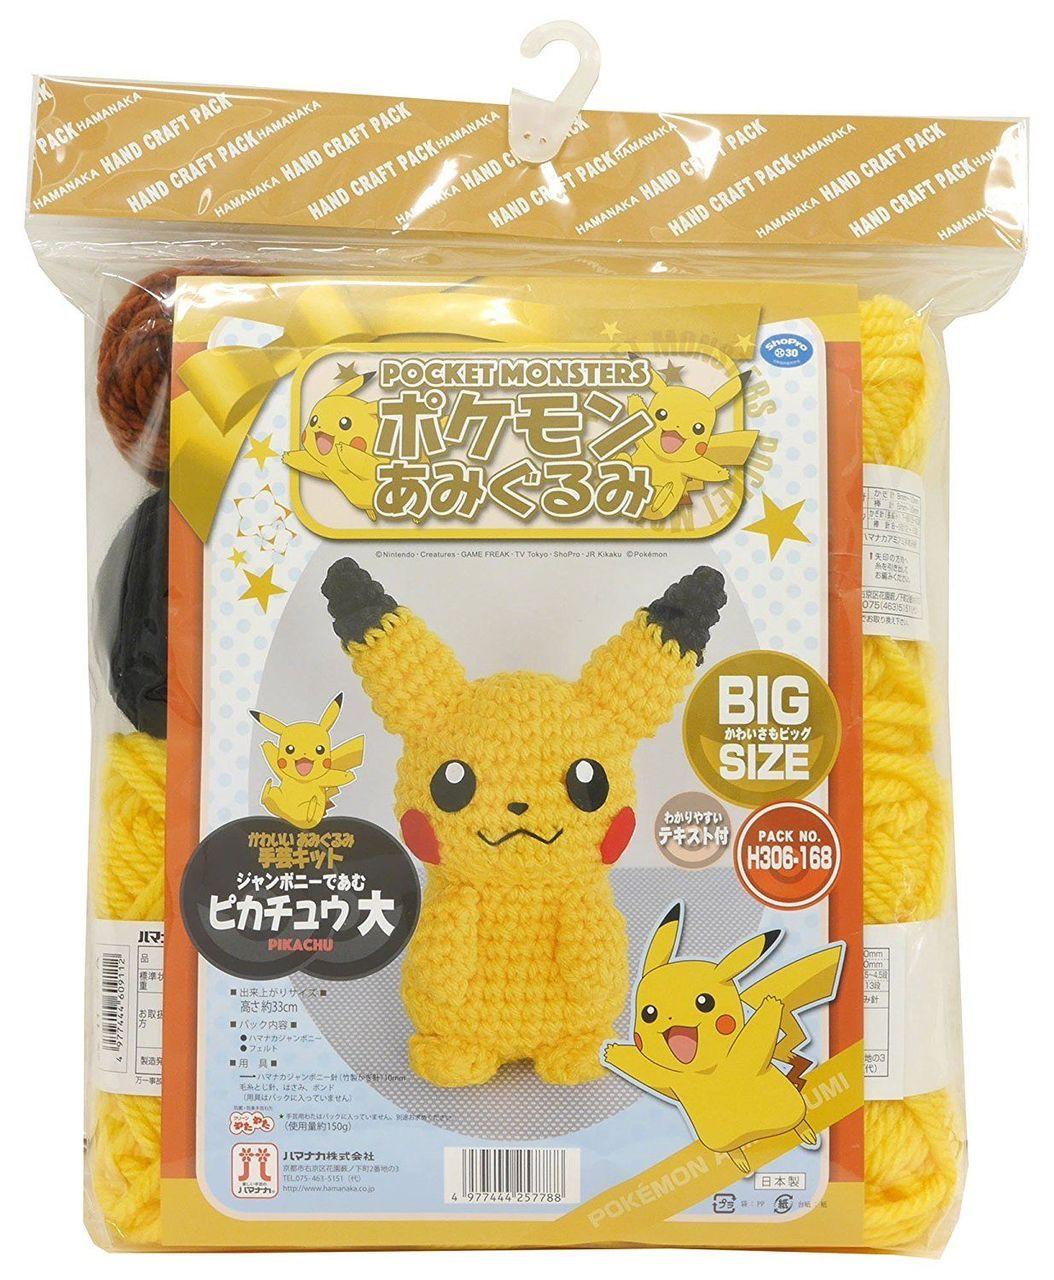 Pokemon Pikachu Amigurumi, Pokemon Crochet Gamer Gift Plush Toy ... | 1280x1054